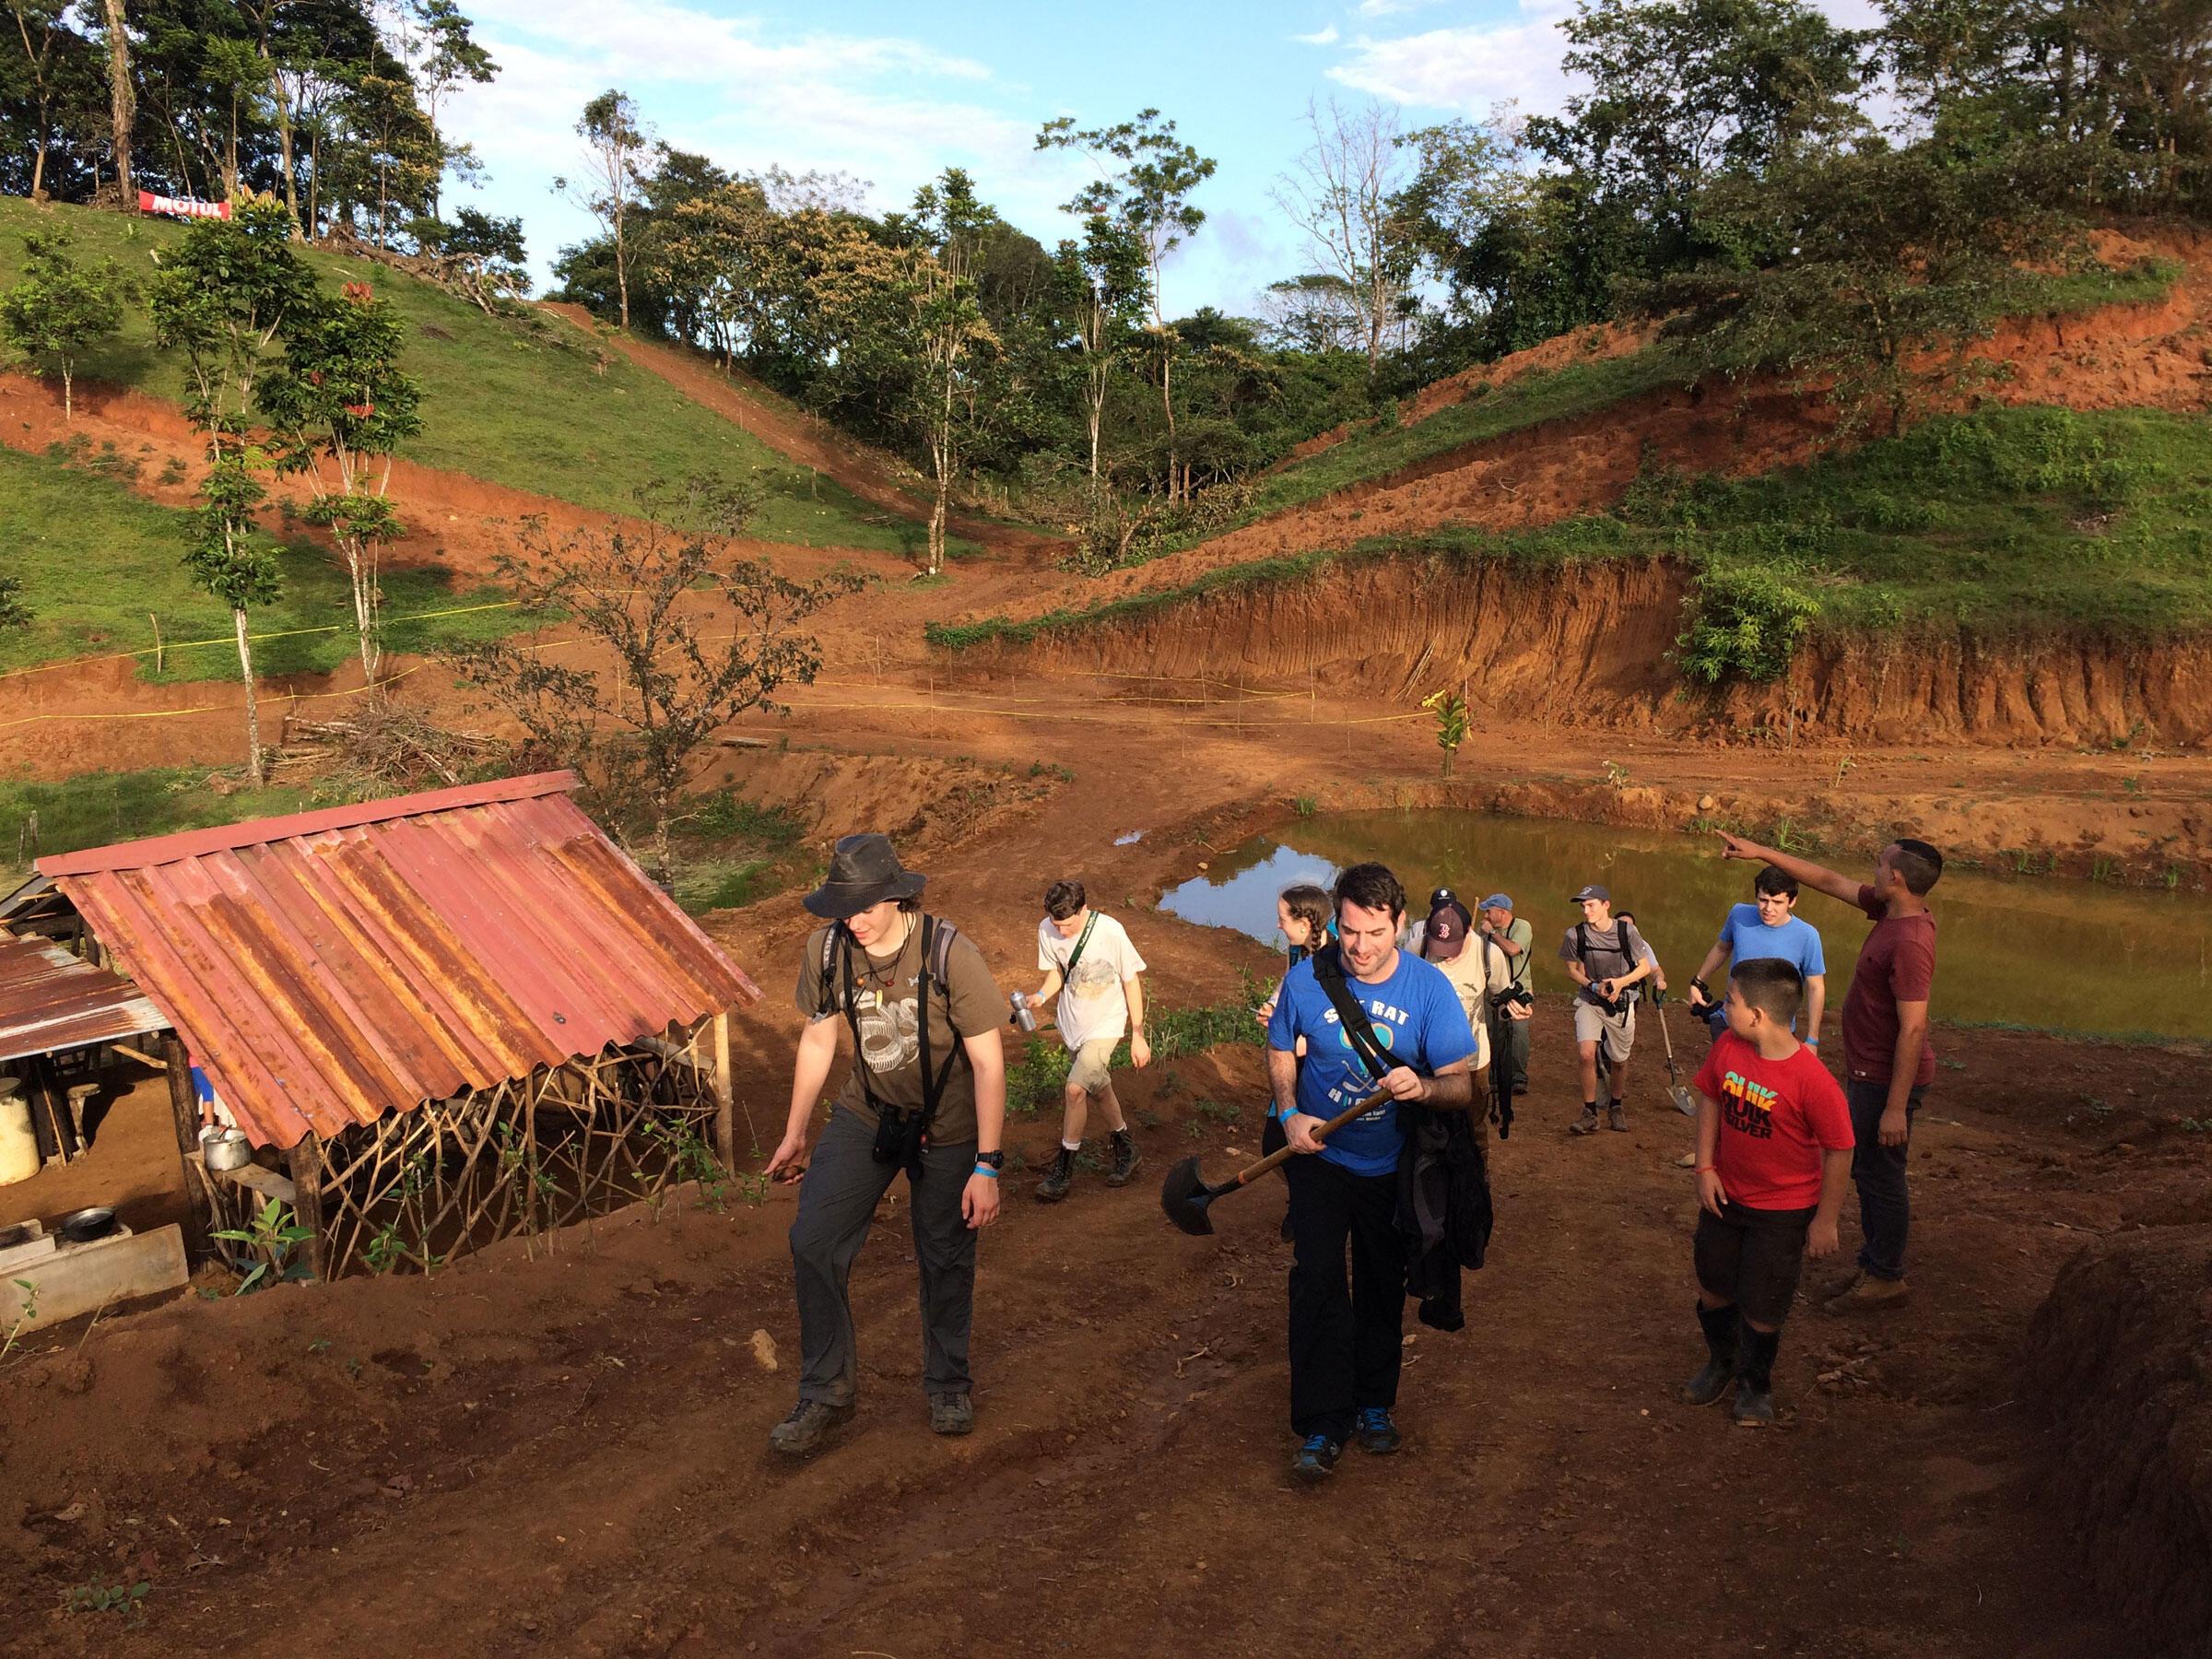 2016 Tropical Teen Camp Reforestation Project, Costa Rica. Hog Island Audubon Camp